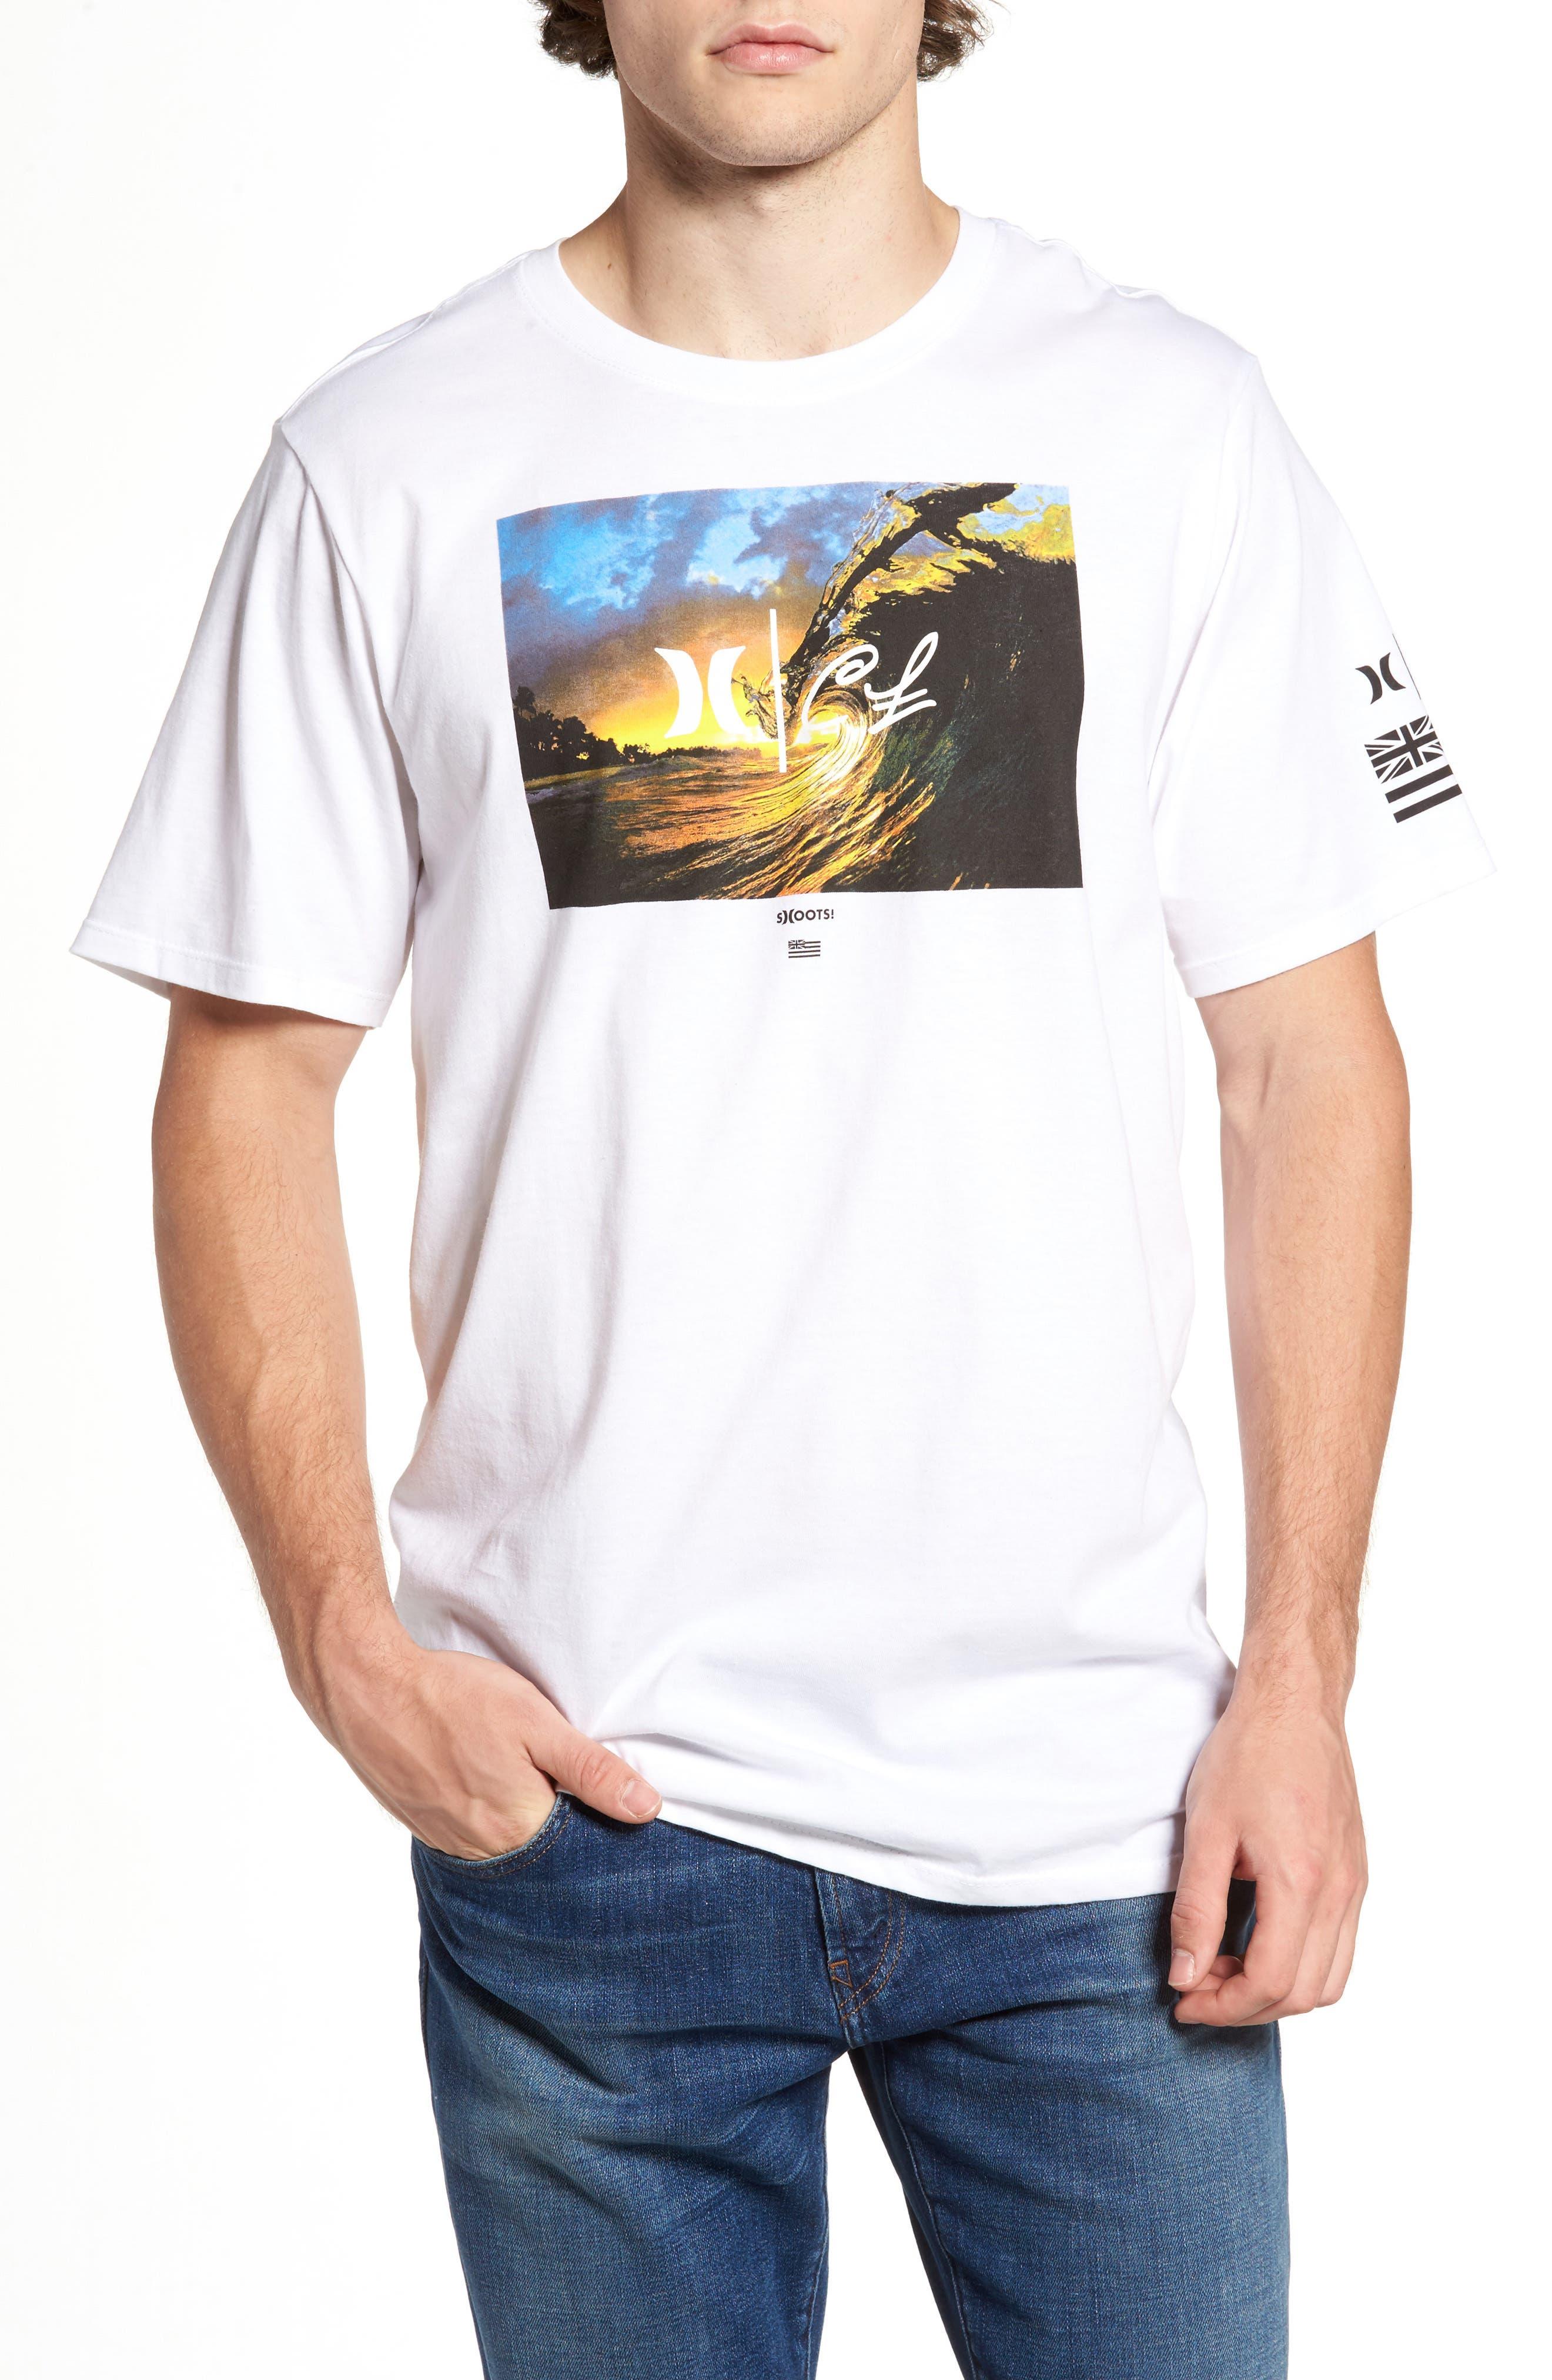 Hurley Clark Little - King Kamehameha Graphic T-Shirt